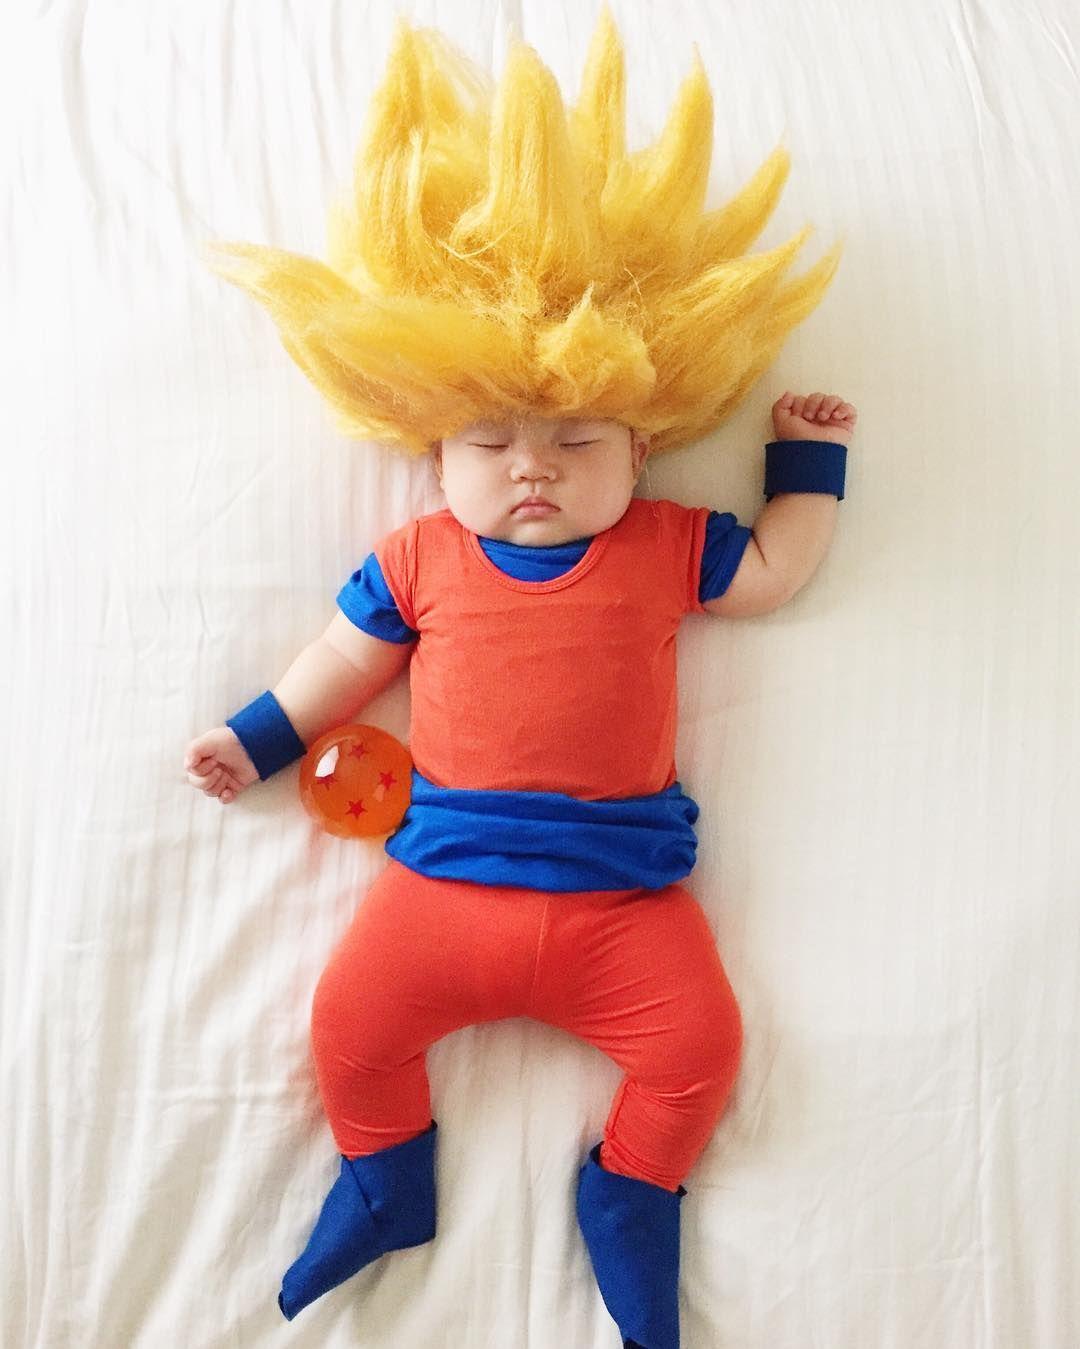 cosplay-baby-05 //.diyphotography.net/baby. Goku CostumeBaby ... & cosplay-baby-05 http://www.diyphotography.net/baby-girl-stars-series ...